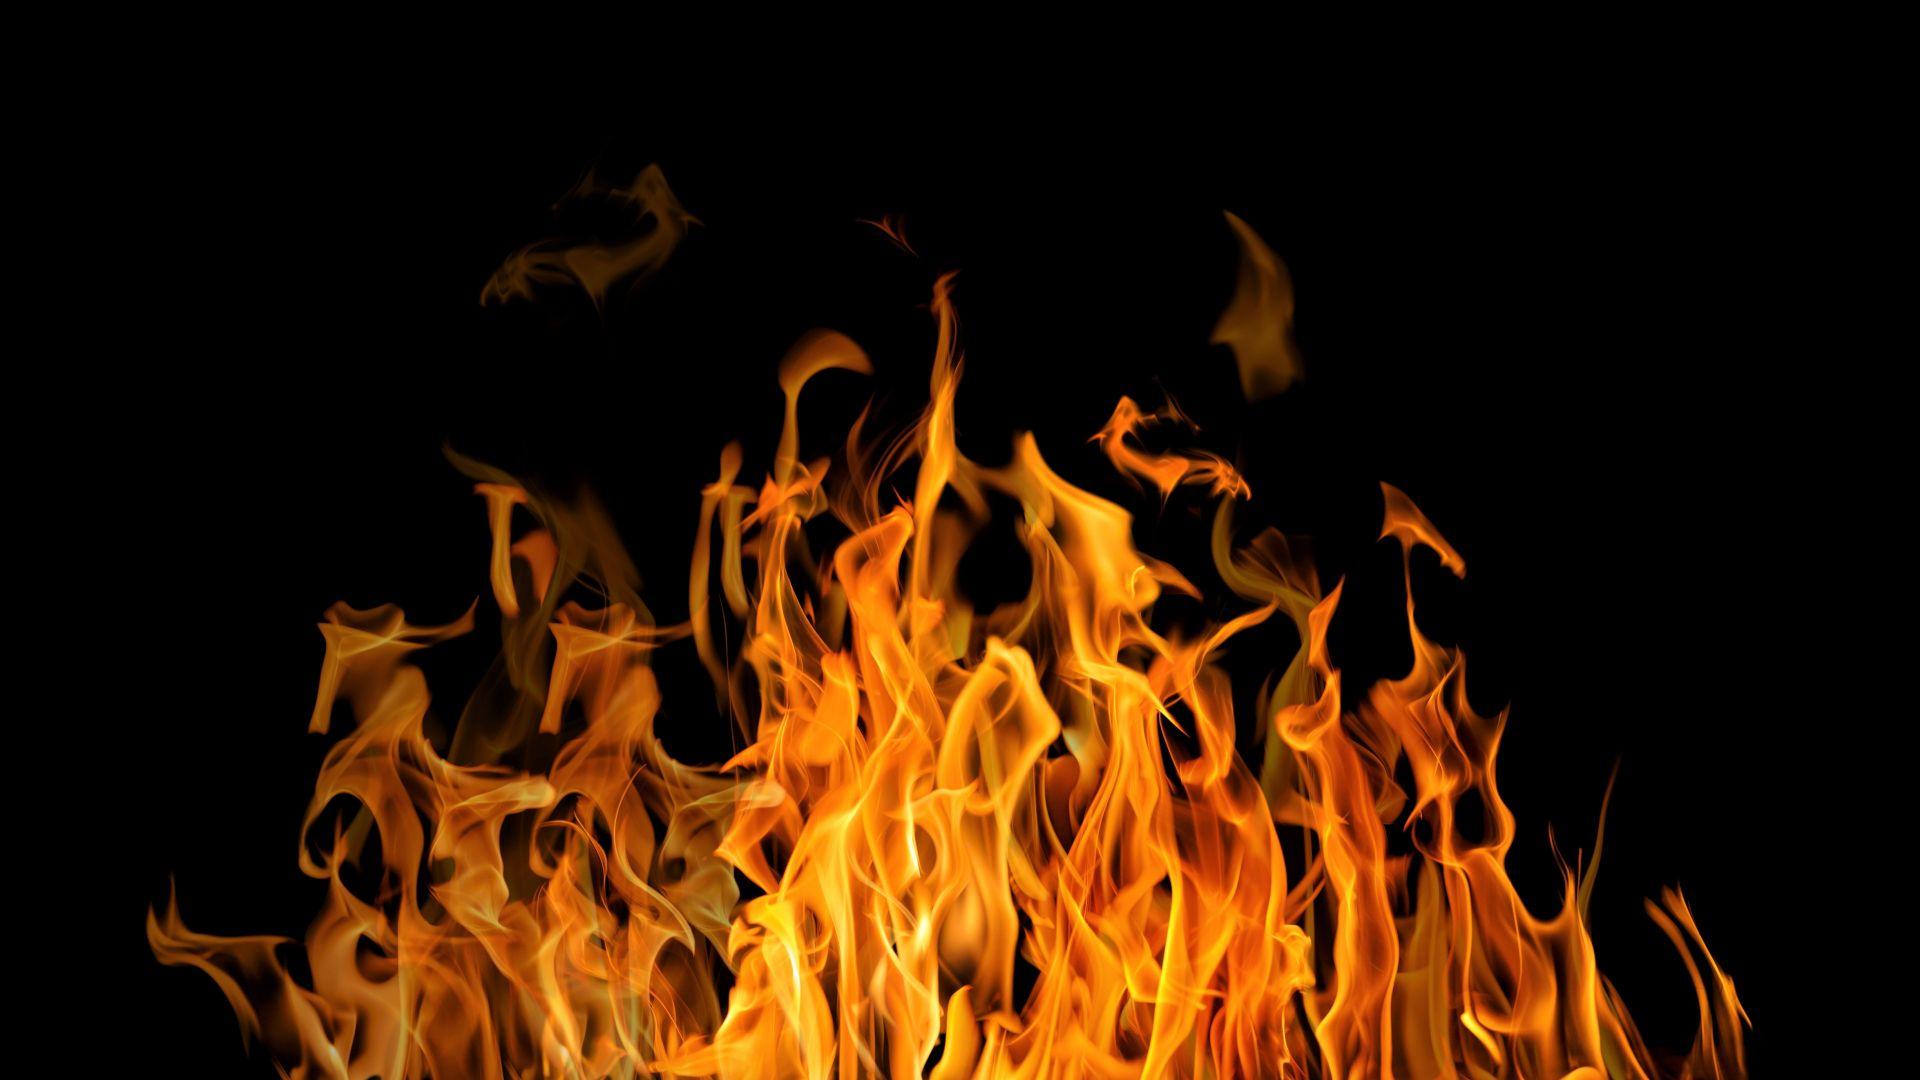 Desktop Wallpaper Fire Flames Dark 4k Hd Image Picture